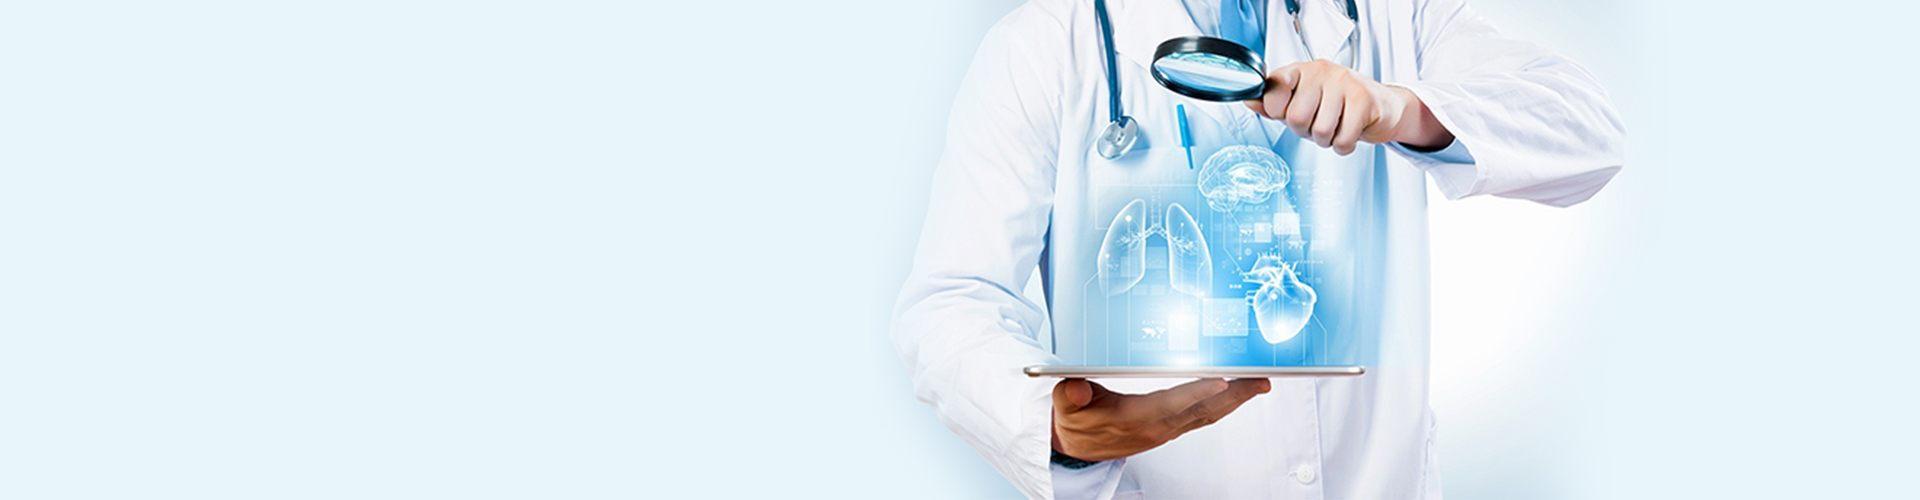 Медицинская страховка во Франции